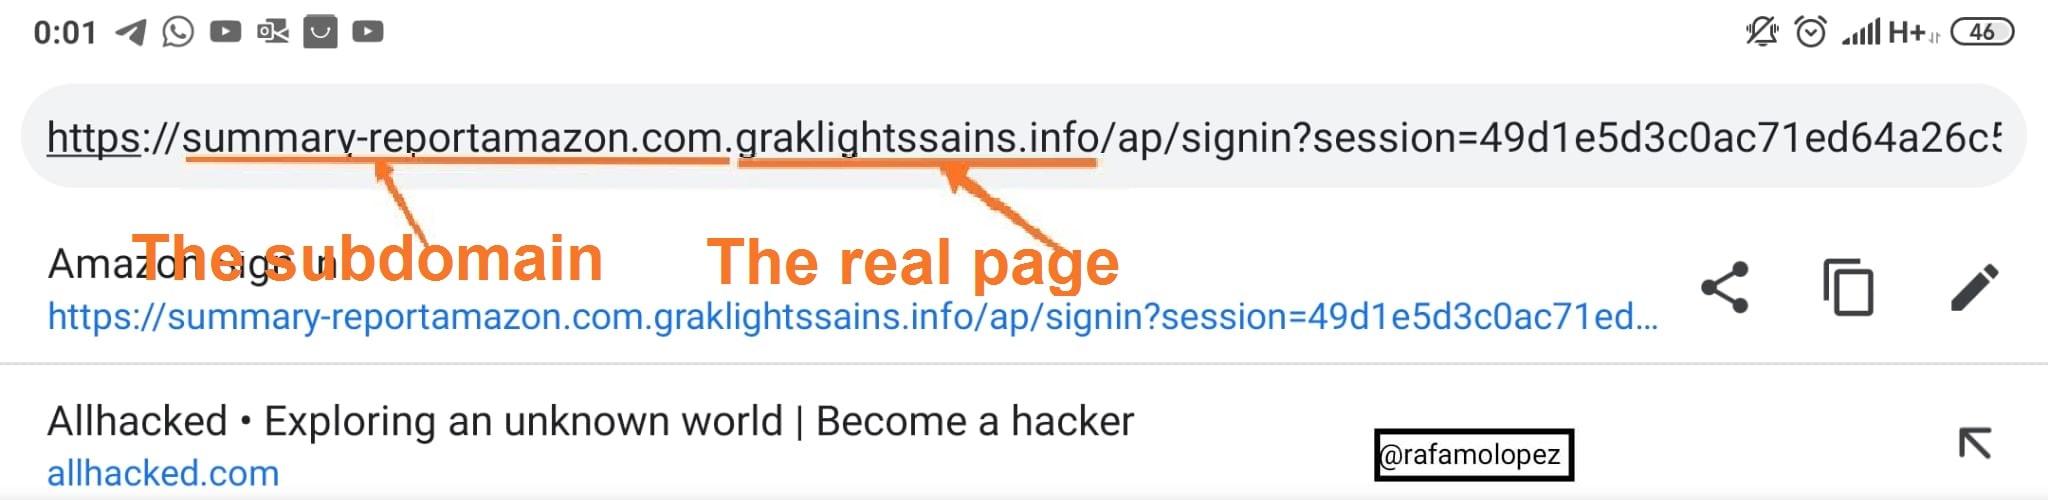 Viendo URL.